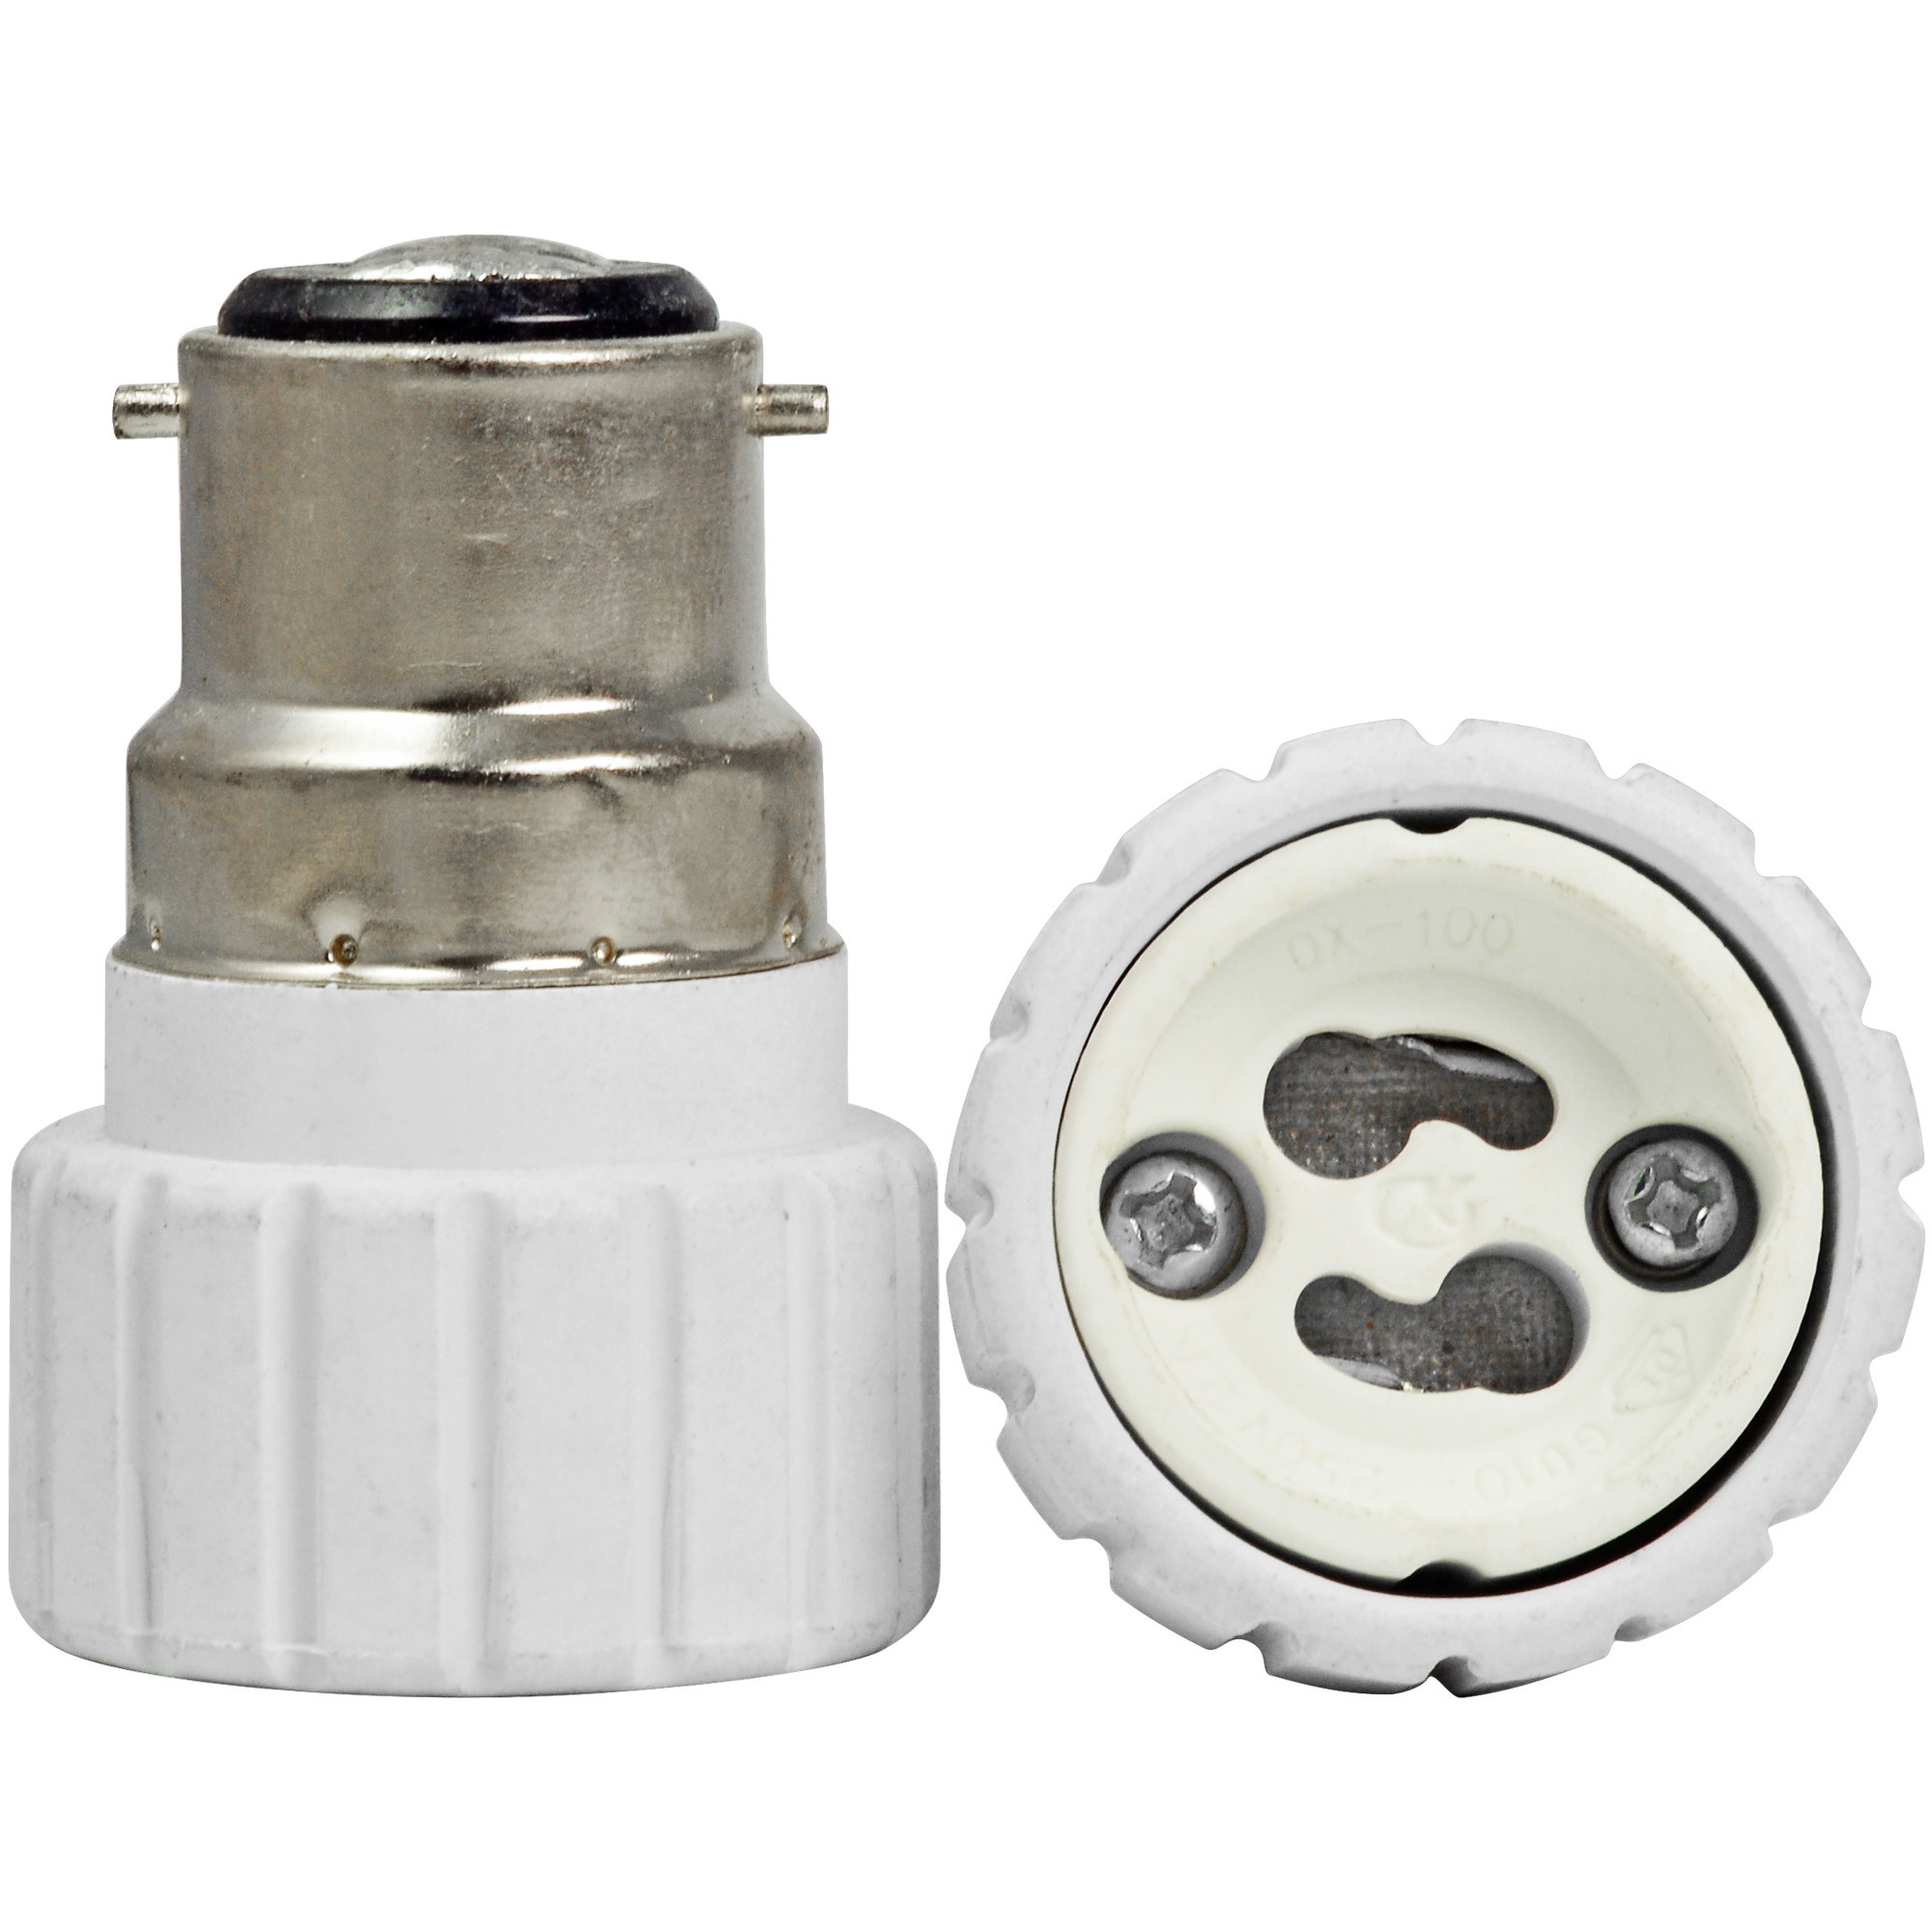 MENGS®  High Quality Lamp Base Adapter B22 to GU10 LED Light Bulb Socket Converter